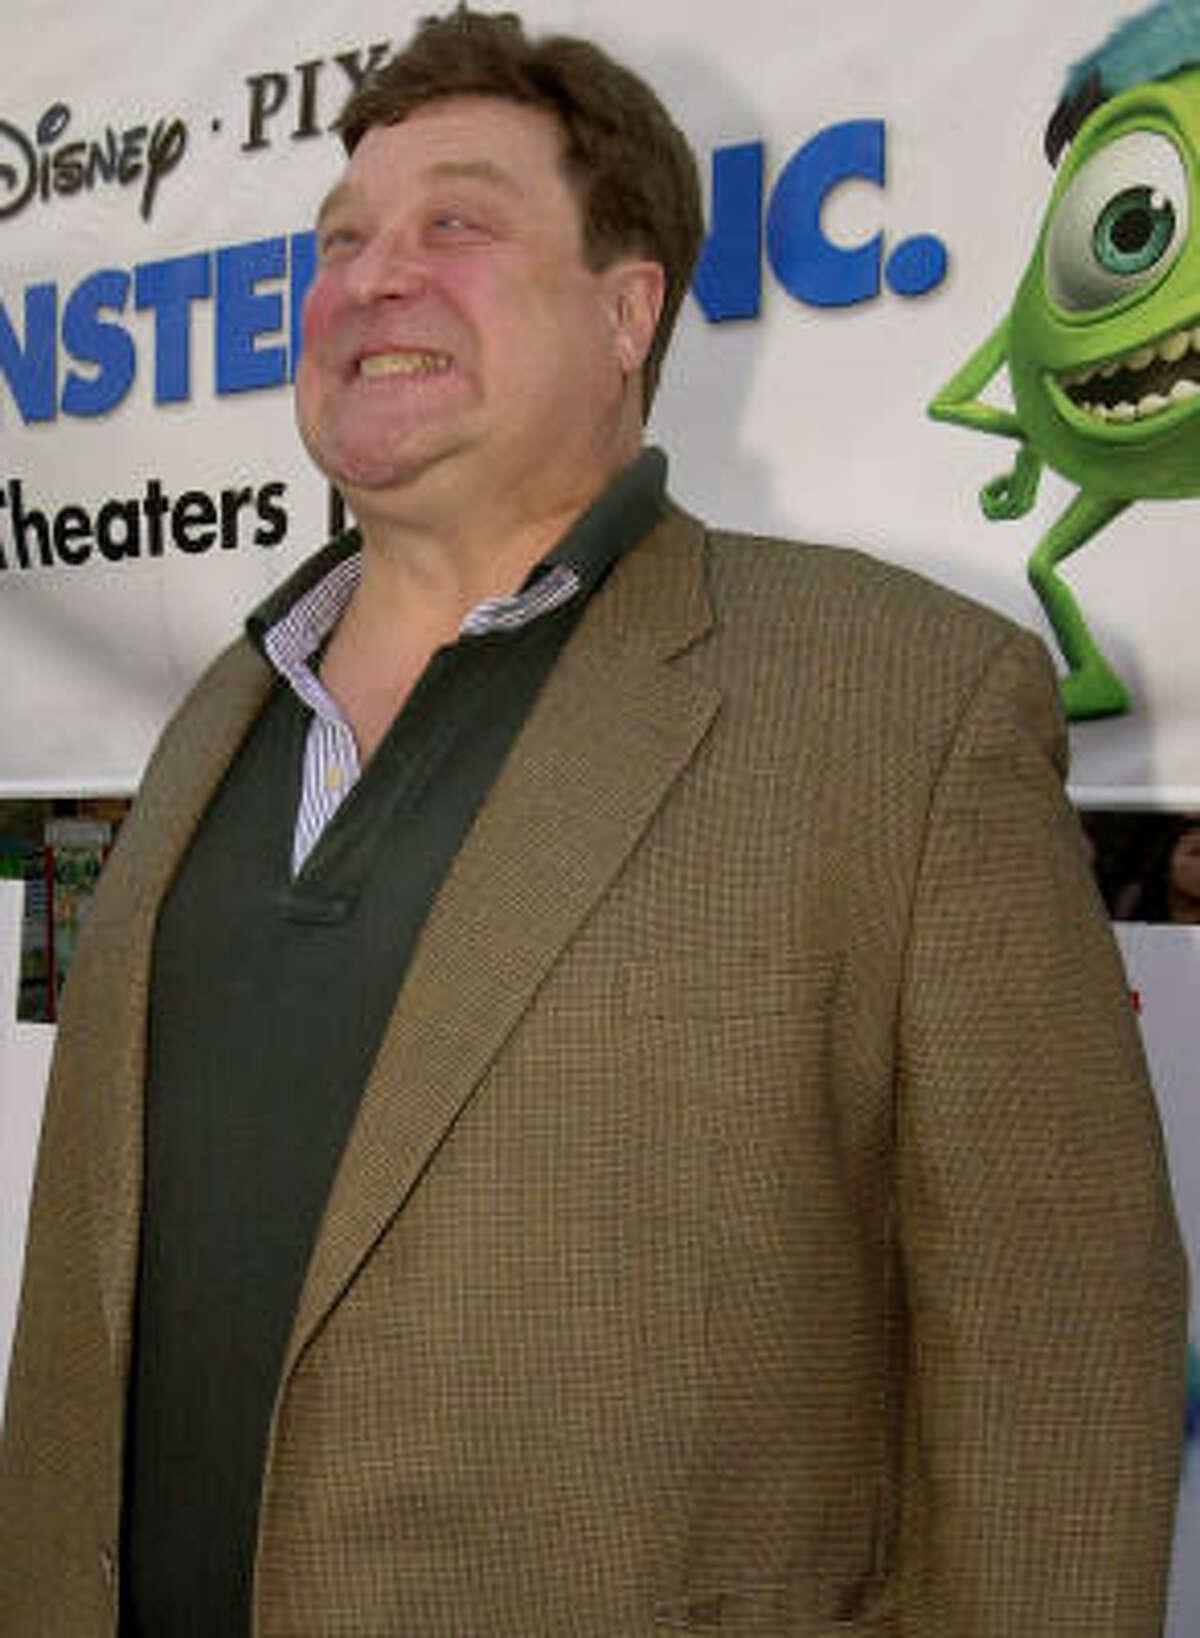 John Goodman: James P. Sullivan in Monsters Inc.